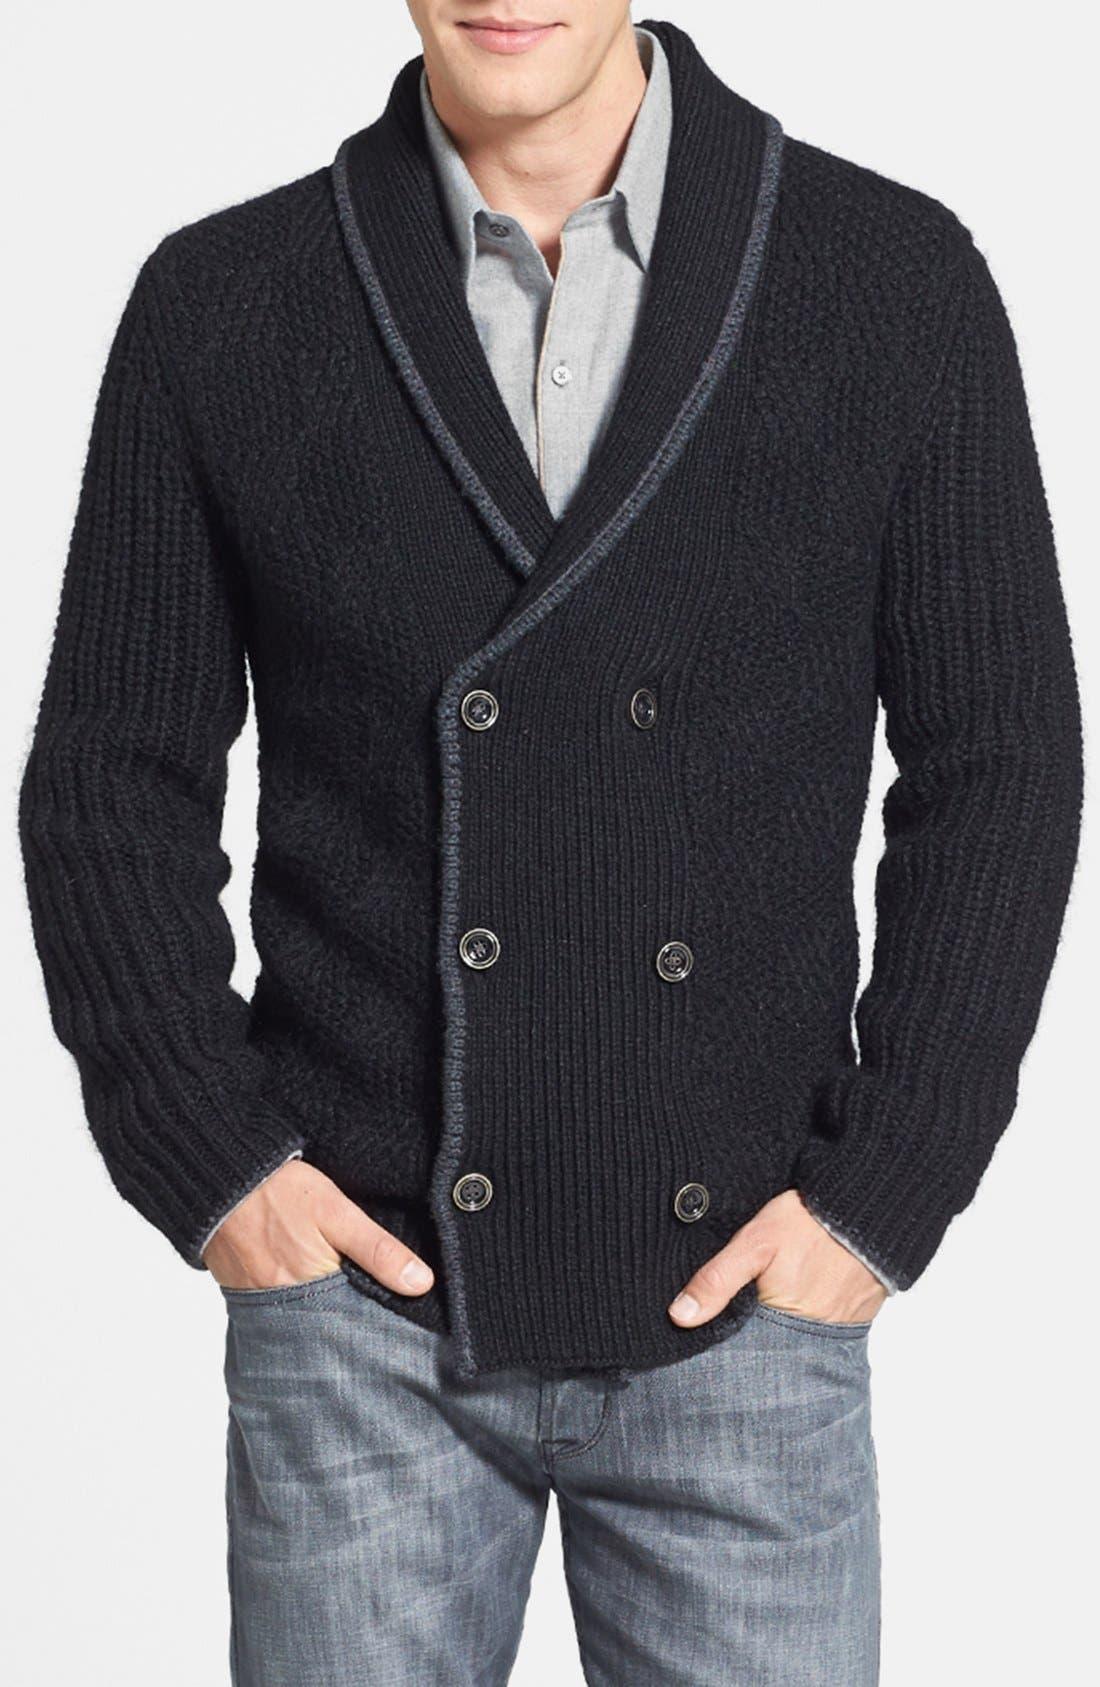 Main Image - Tommy Bahama 'Hudson Square' Regular Fit Cardigan